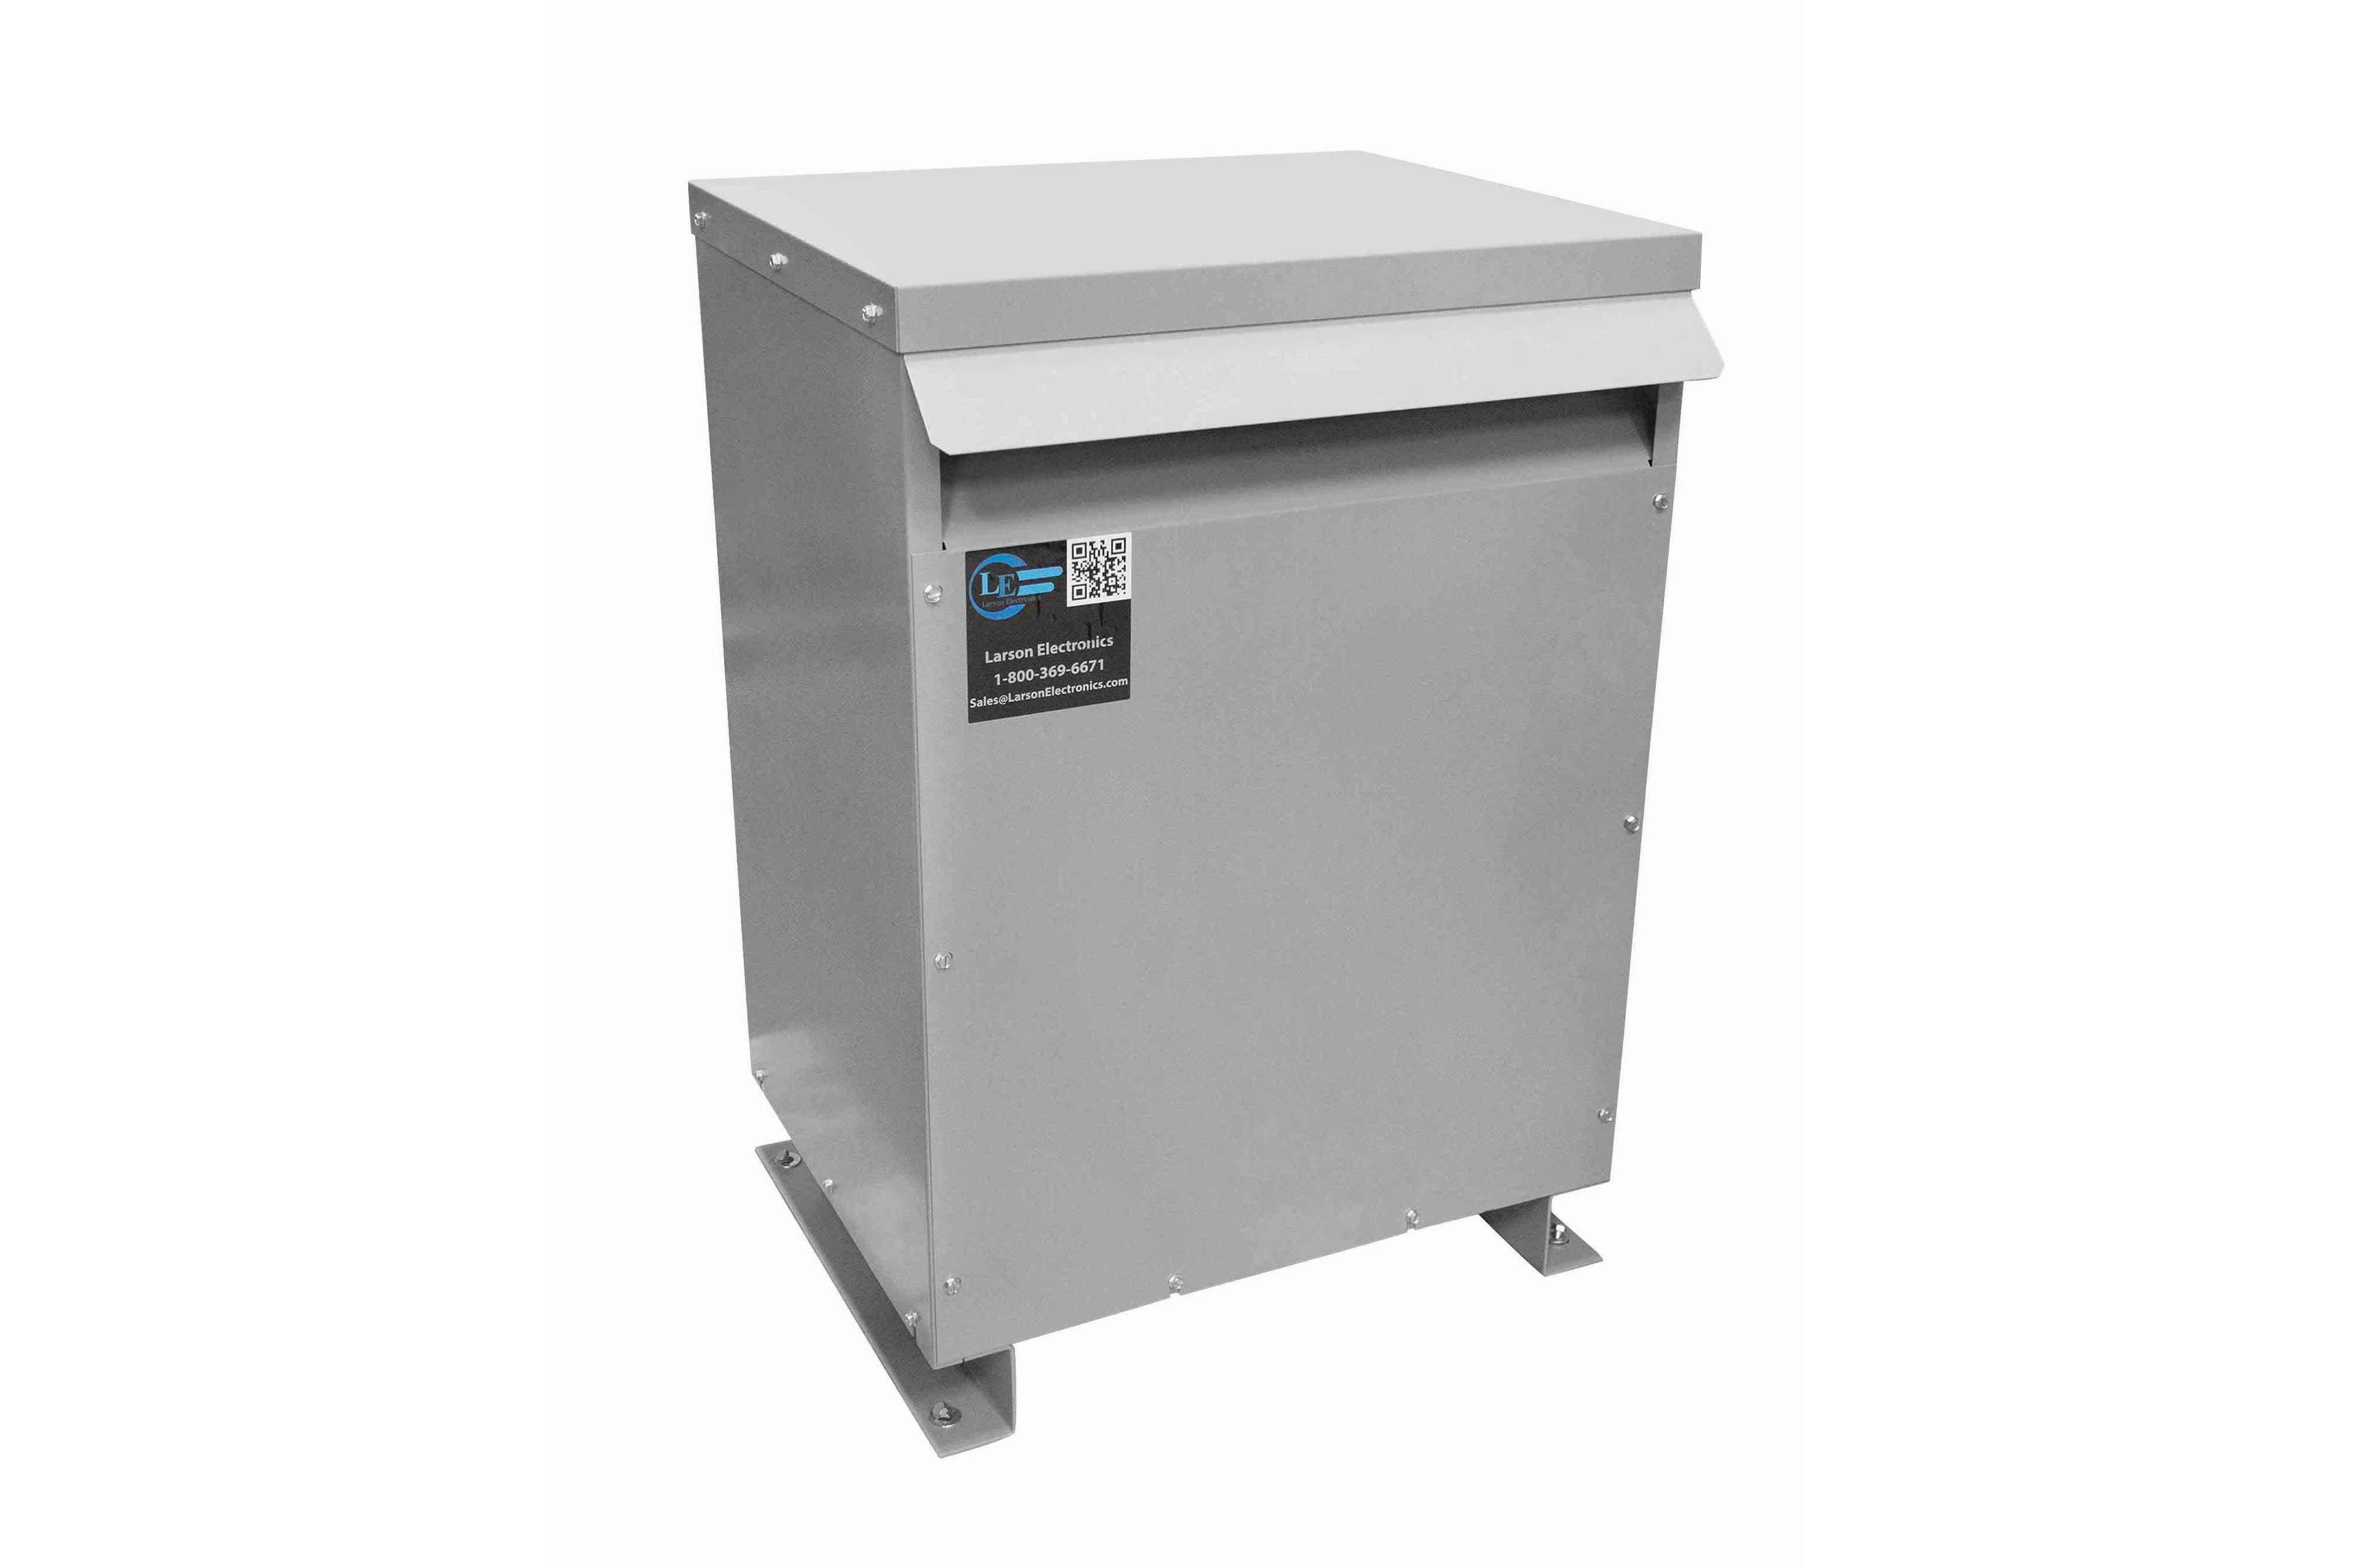 10 kVA 3PH Isolation Transformer, 480V Wye Primary, 480V Delta Secondary, N3R, Ventilated, 60 Hz